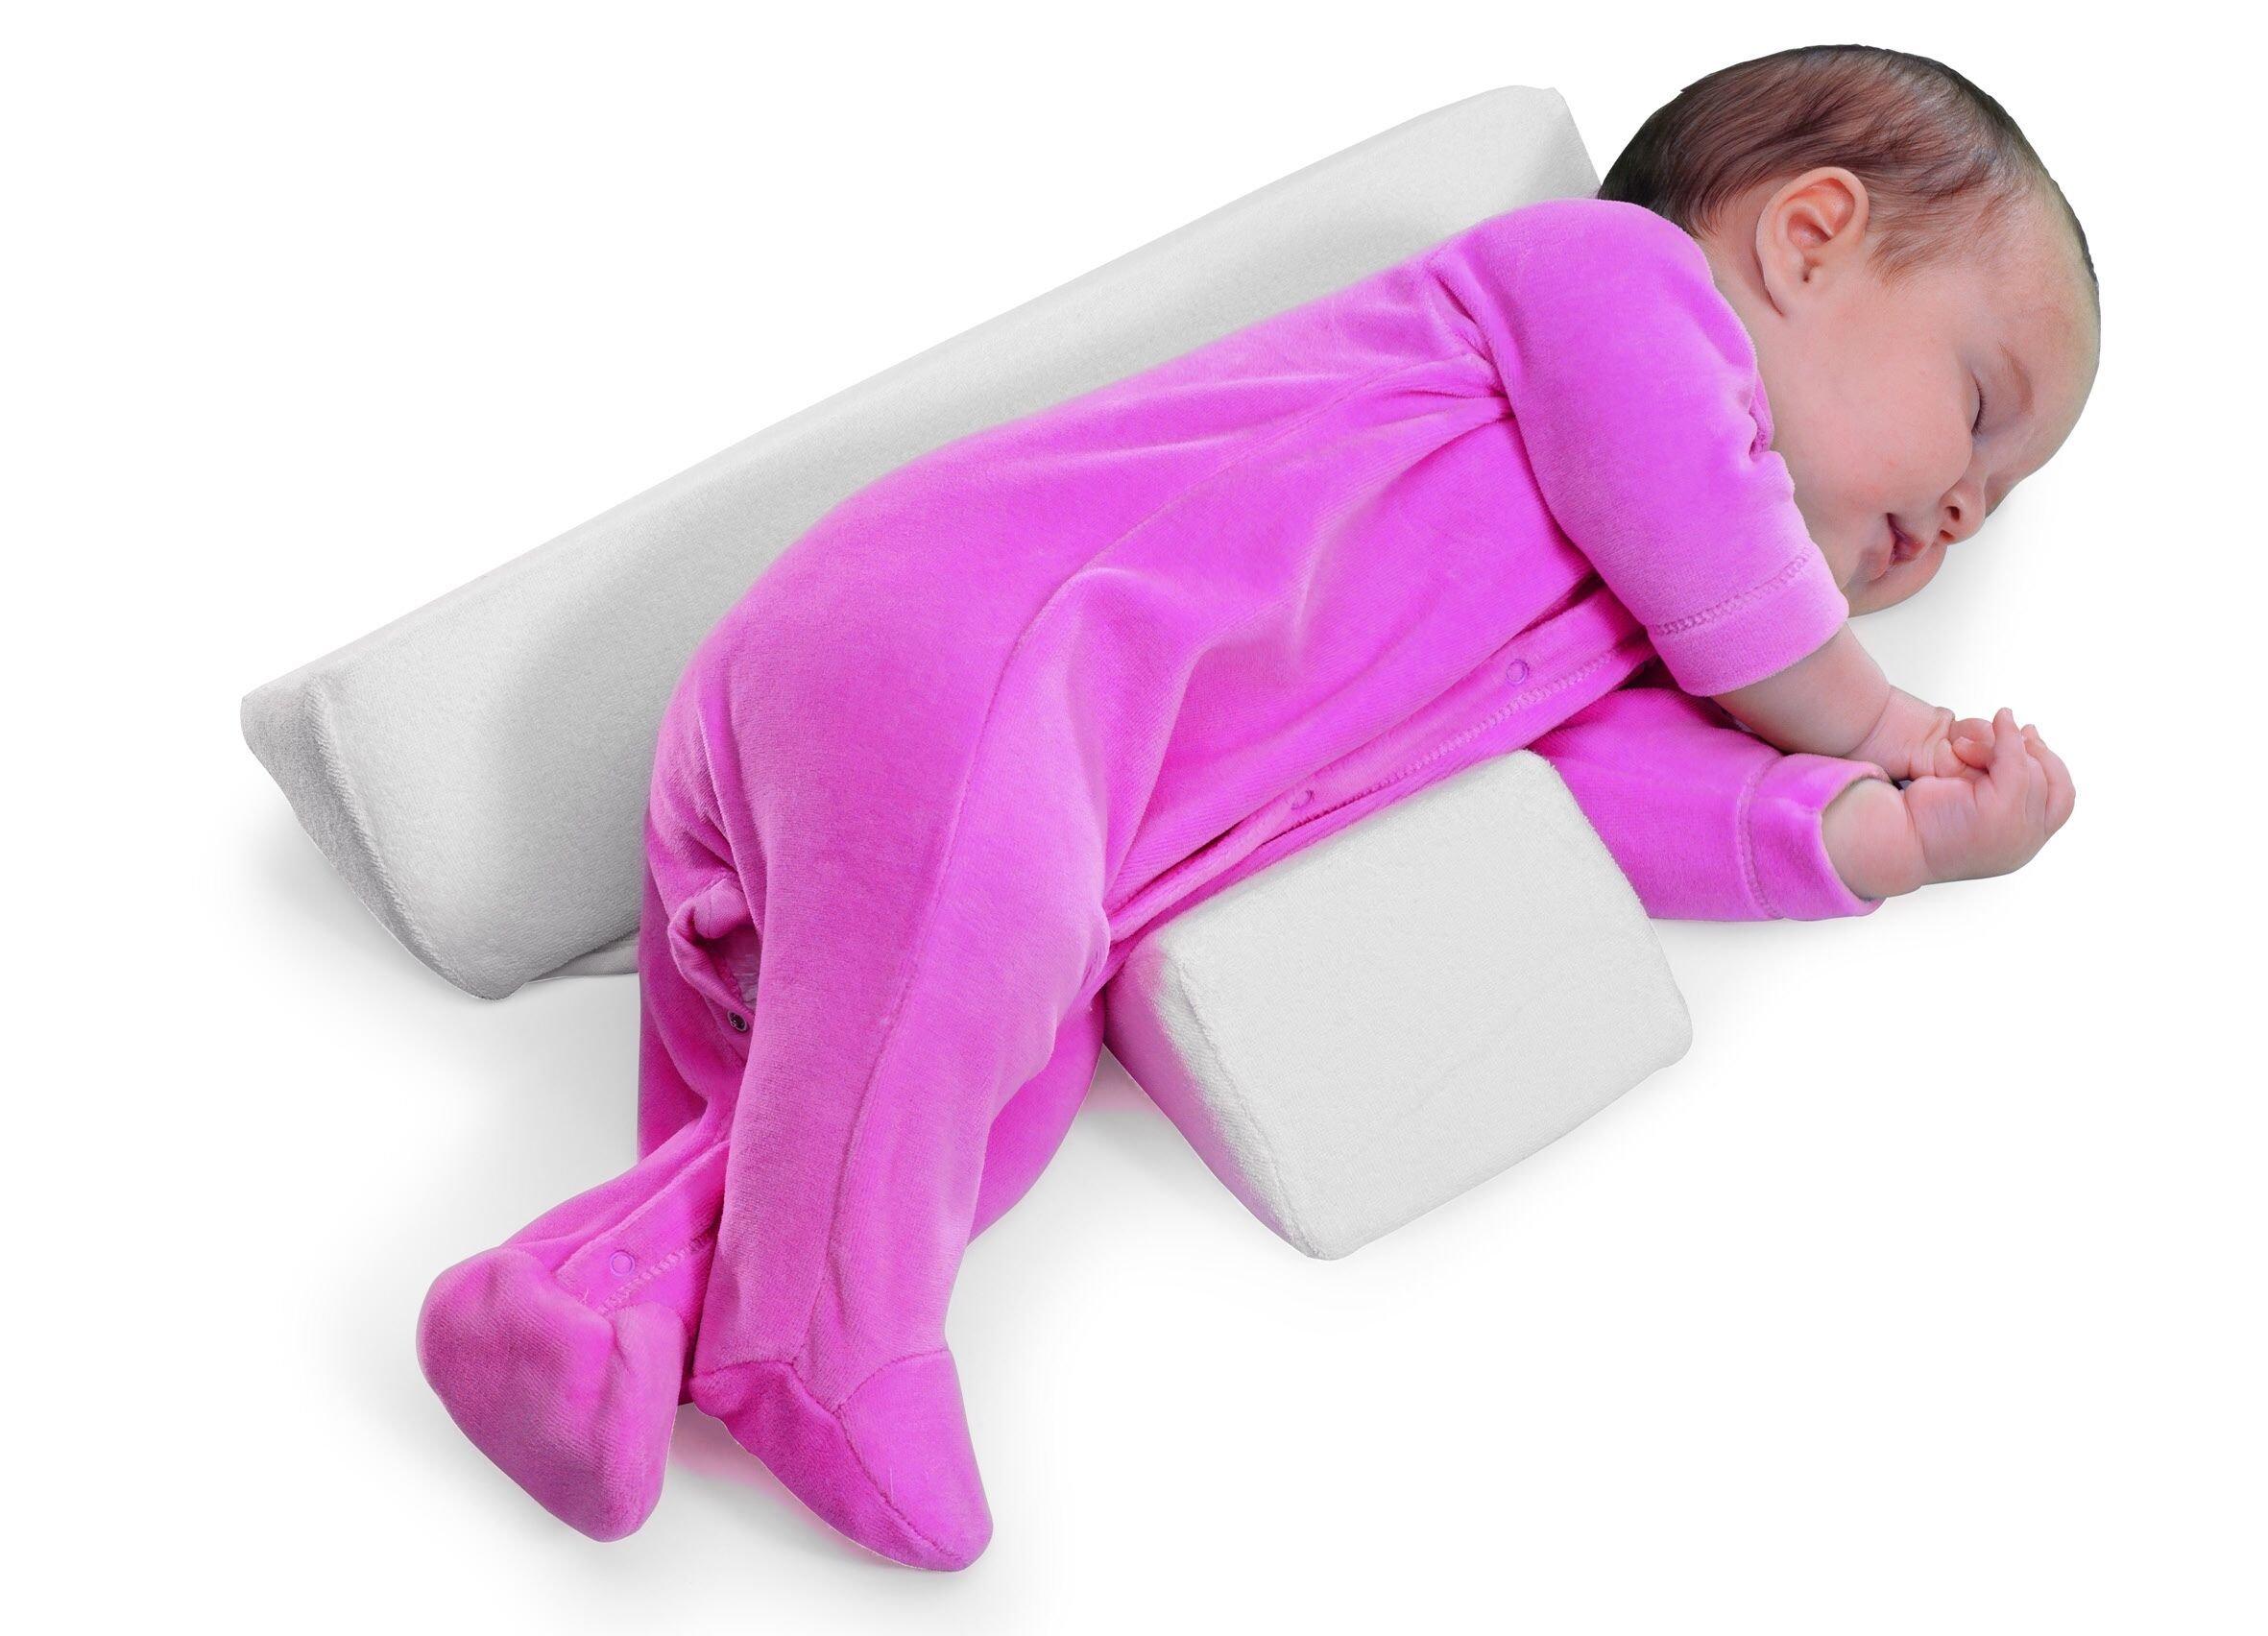 TradeWorld Newborns Infant Sleep Pillow